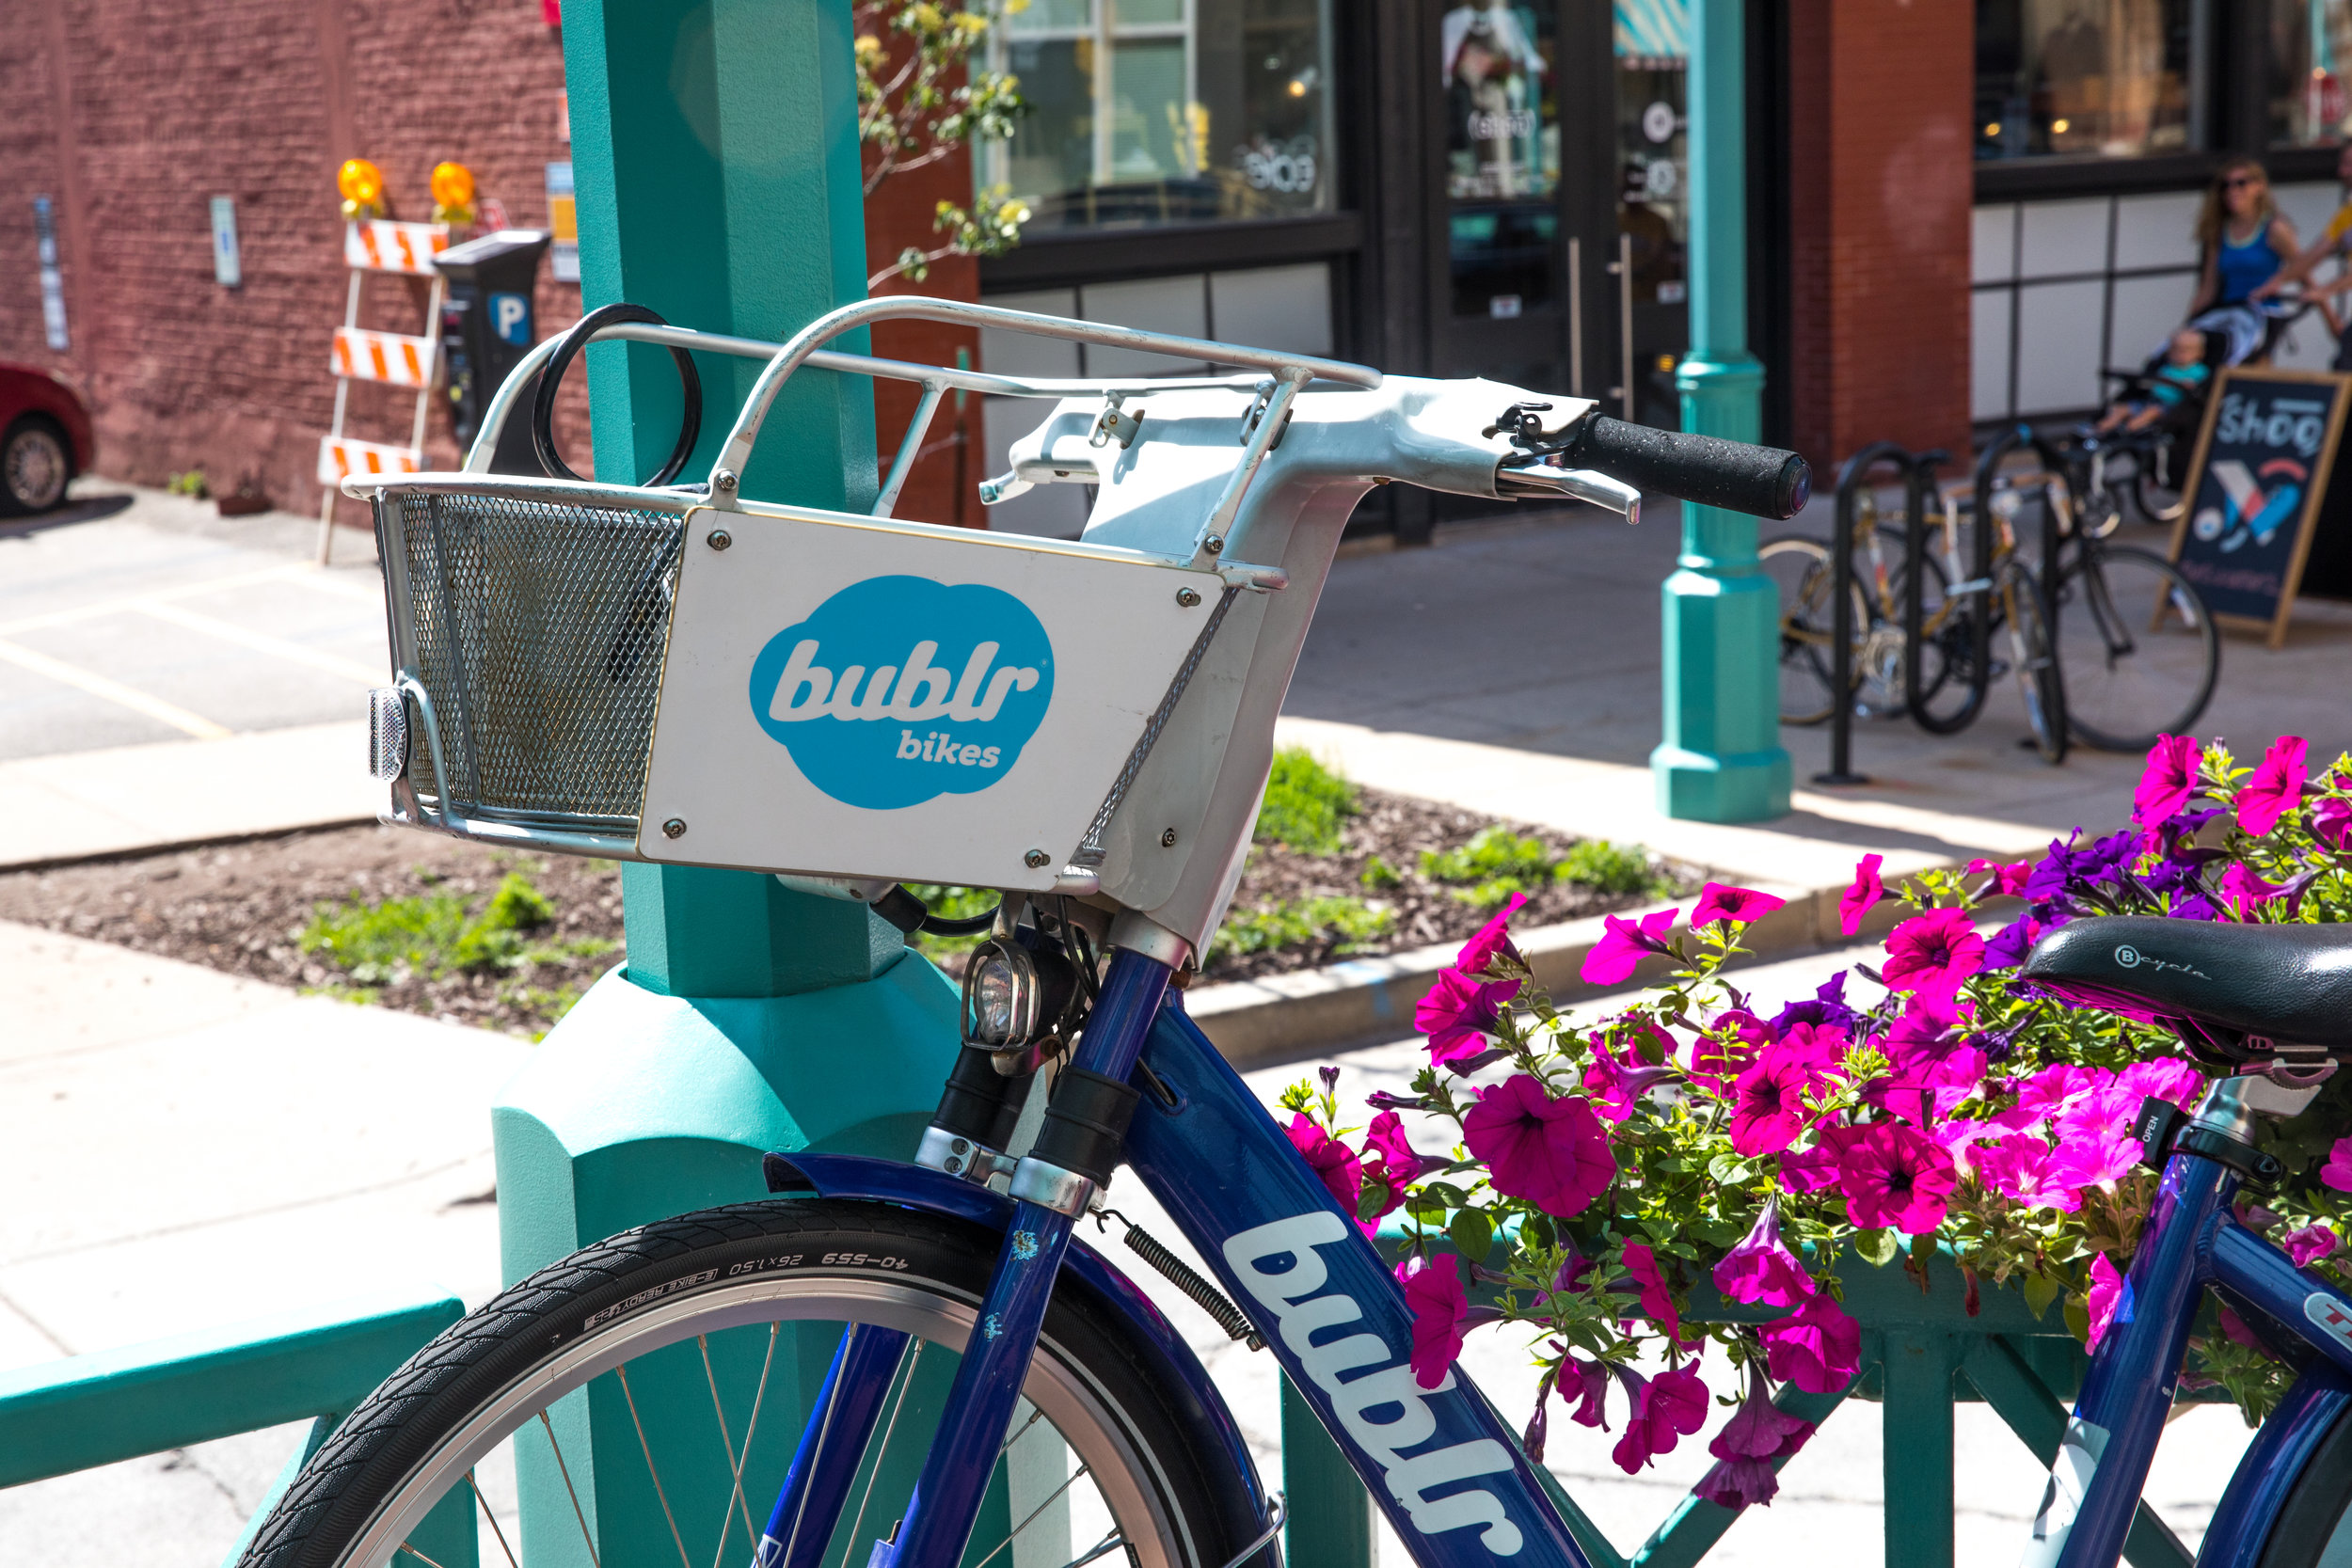 Saddle up! - Bublr your way around Milwaukee.